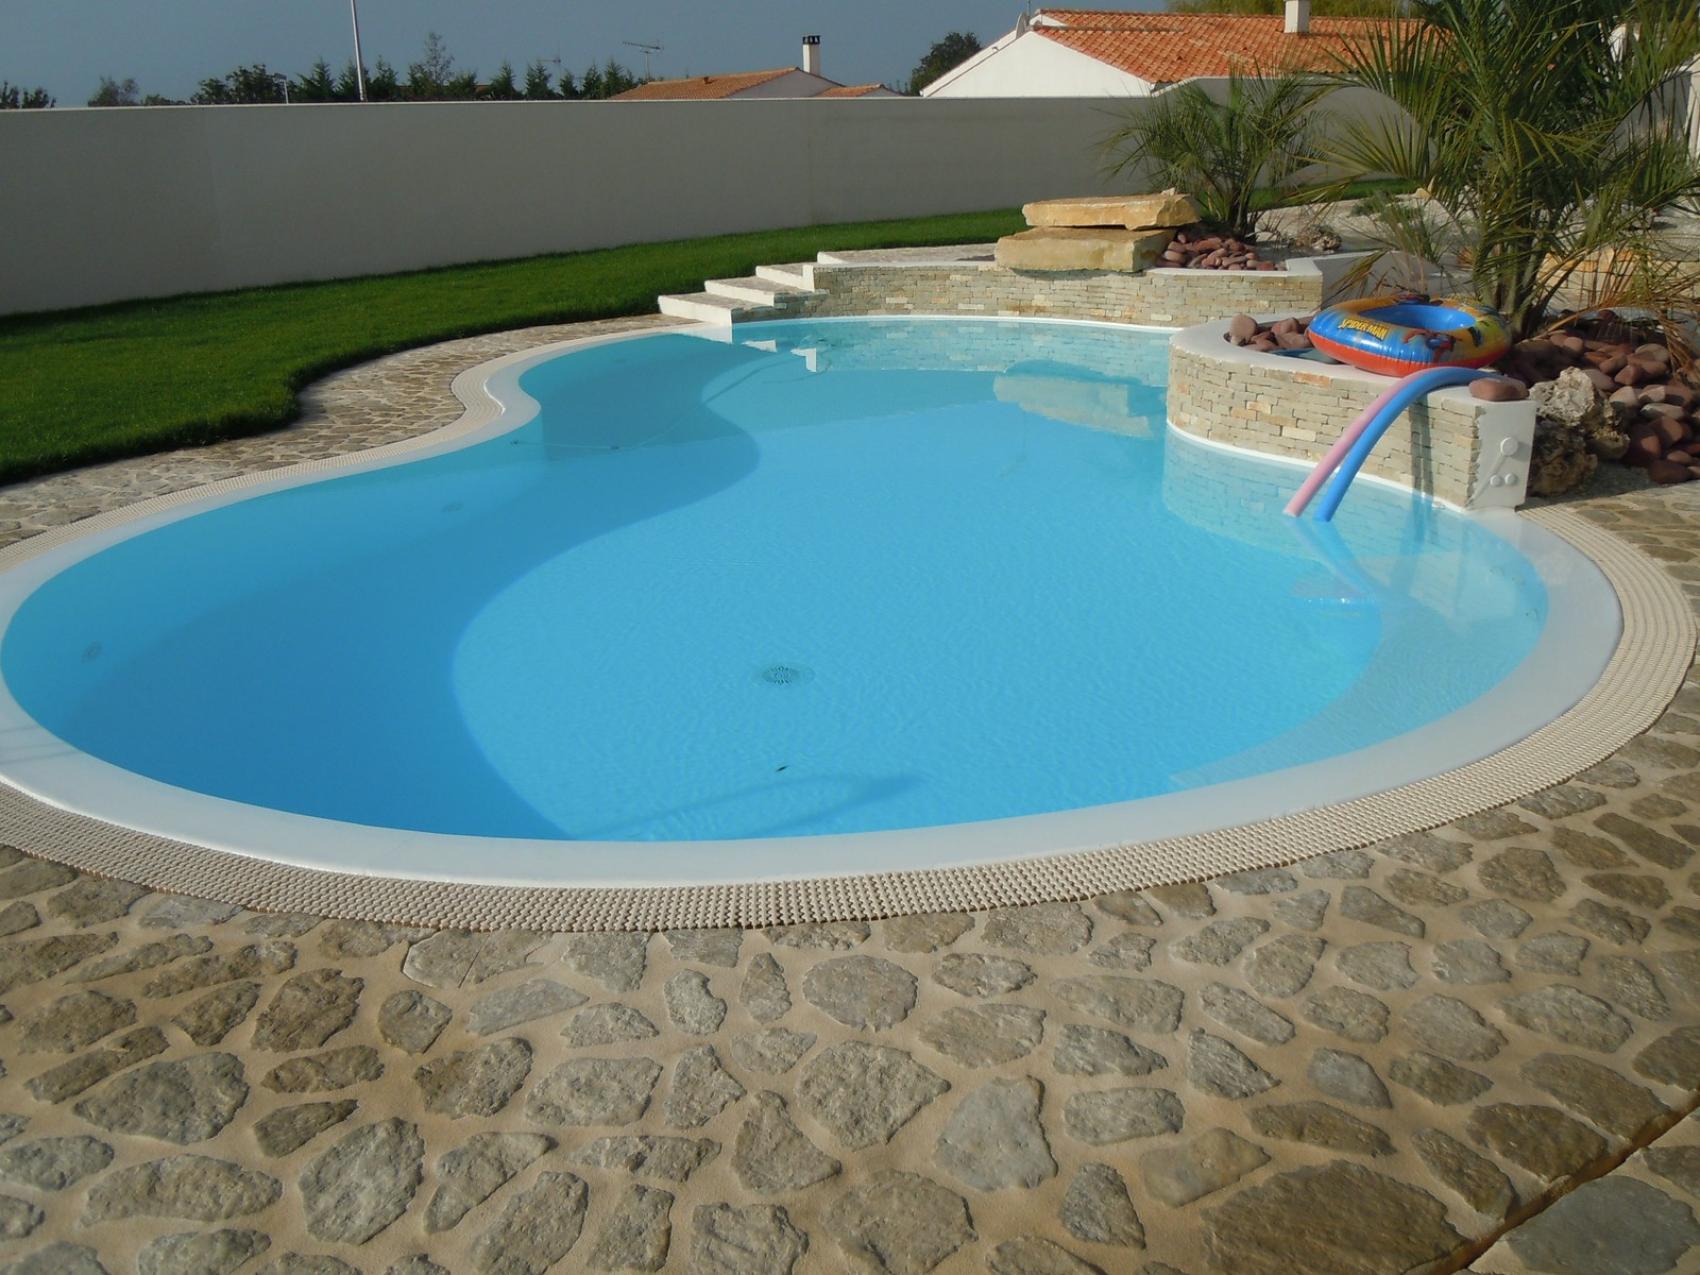 Aydin constructeur piscine la rochelle nous contacter for Construction piscine la rochelle